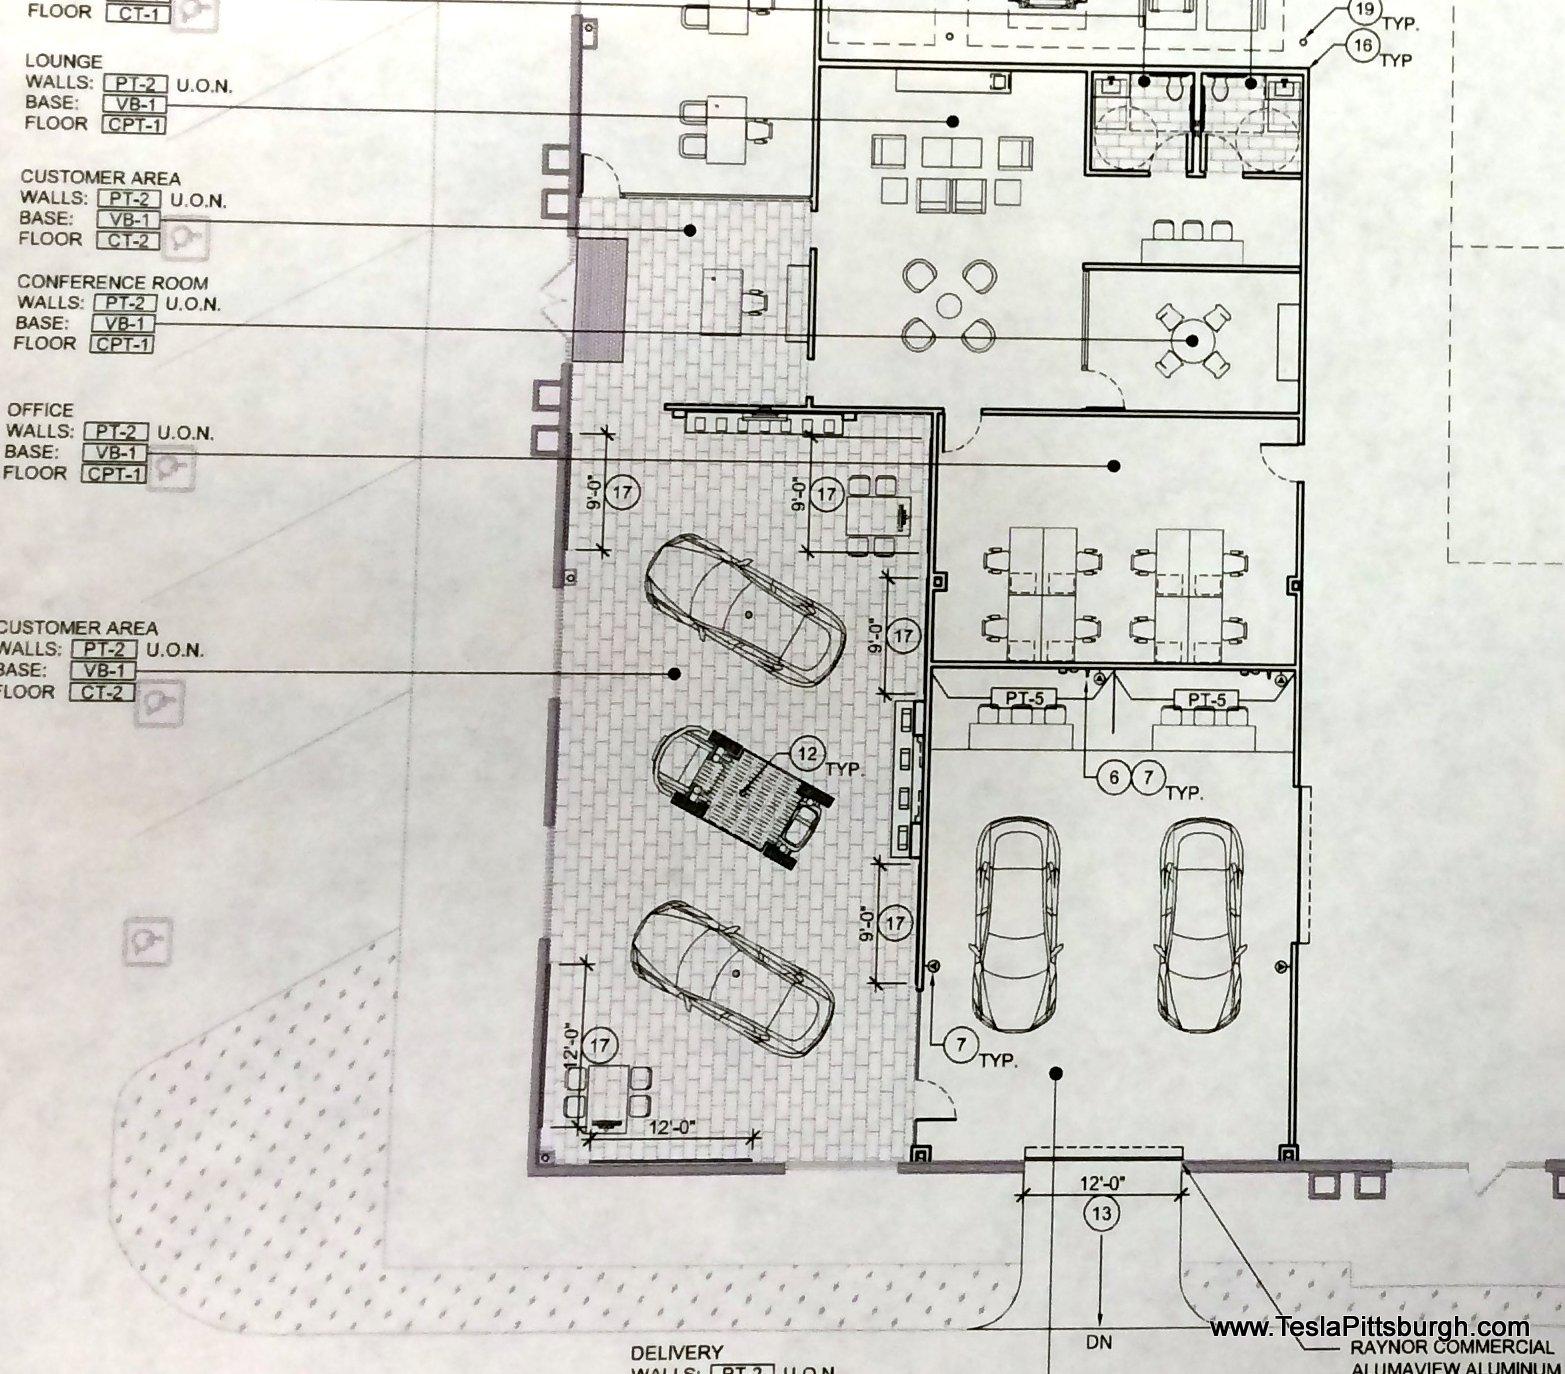 pittsburgh tesla service sales area